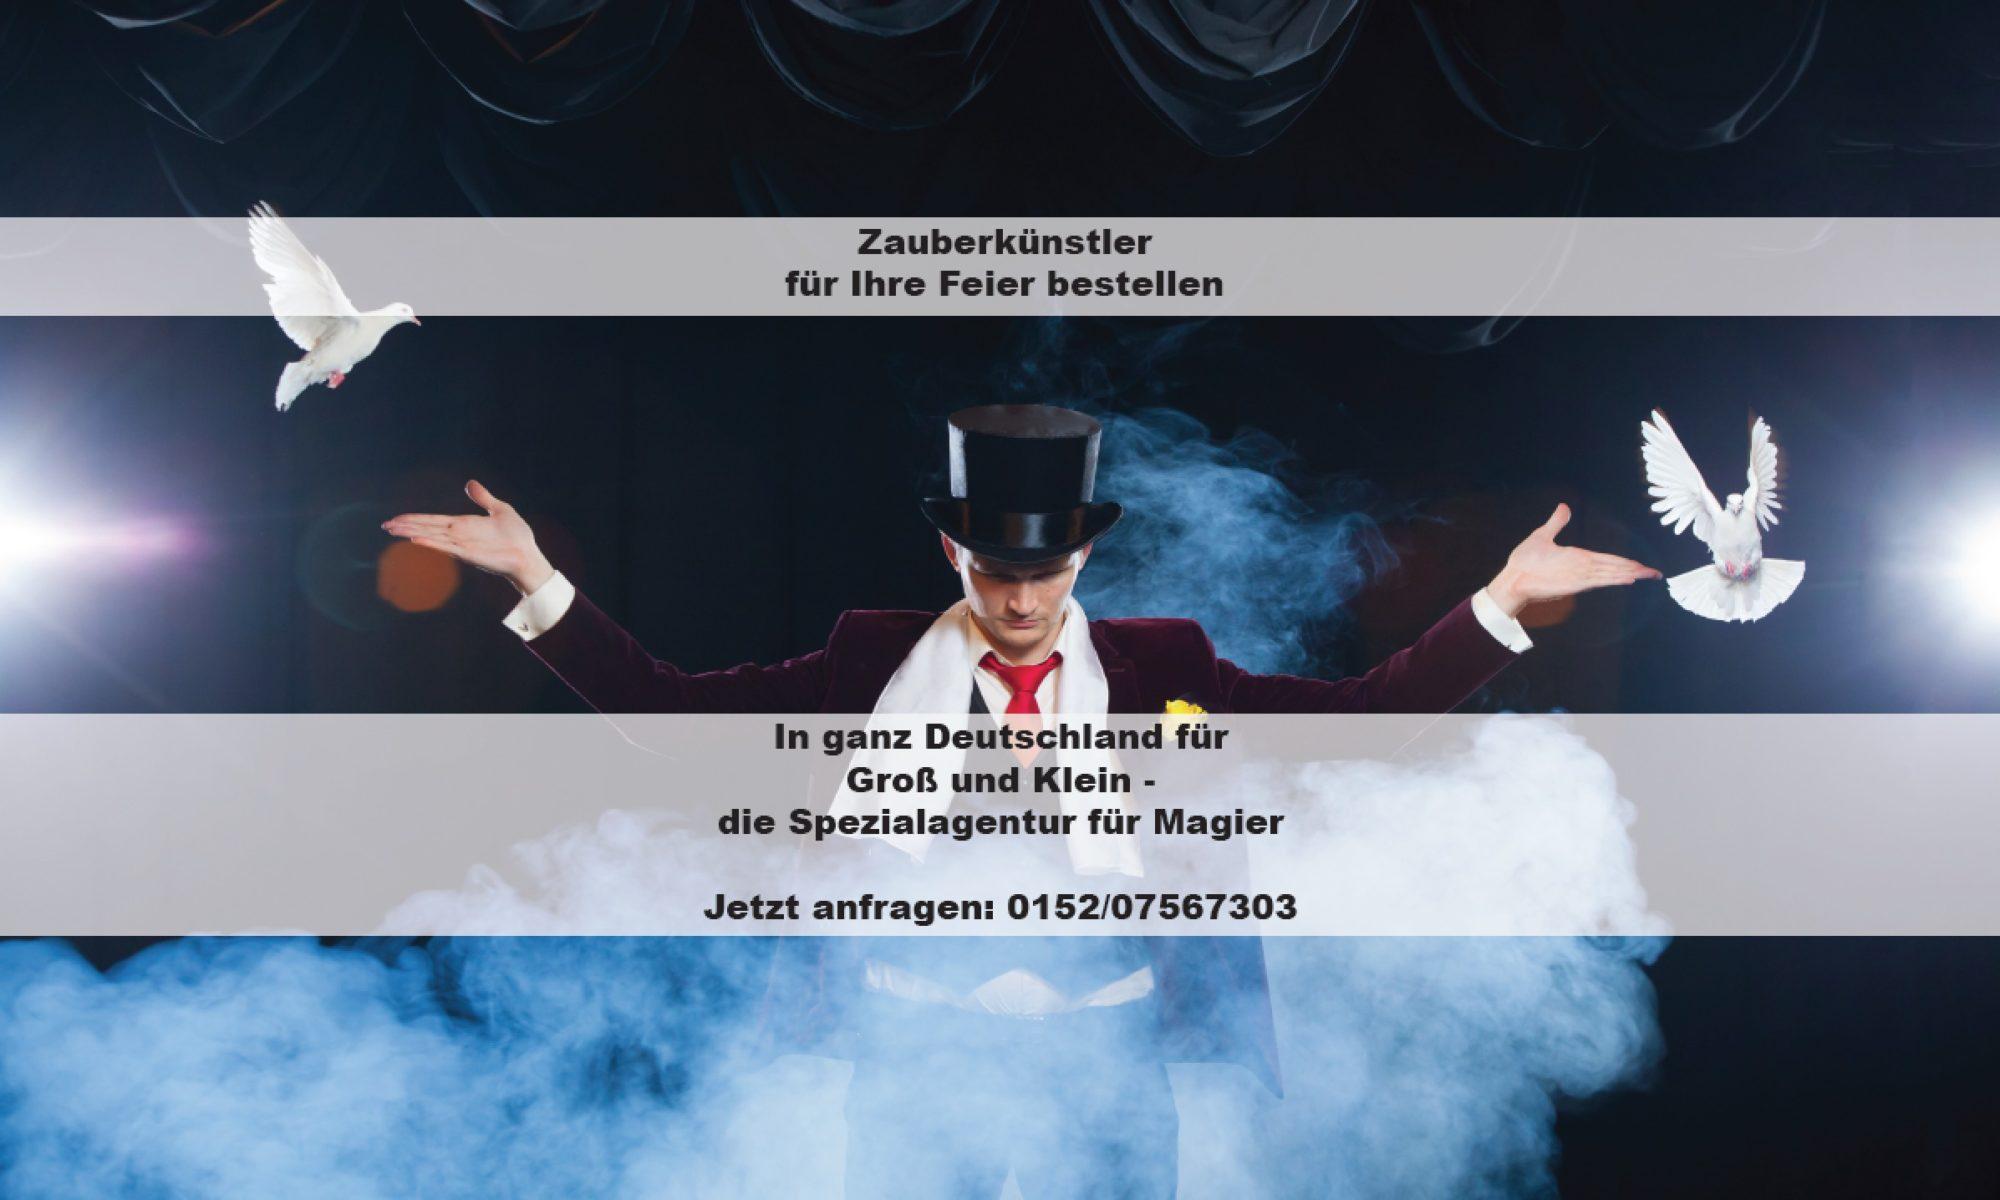 Zauberer für Ihre Feier bestellen, Zauberei Stuttgart, Zauberer mieten, Zaubern lernen, Zauberschule, Magier, Zauberer Berlin, zauberer Köln, Zaubershow München, Zaubershow Berlin, Zaubershow Kindergeburtstag, Closeup Zauberer Hochzeit, Zaubershow Weihnachtsfeier